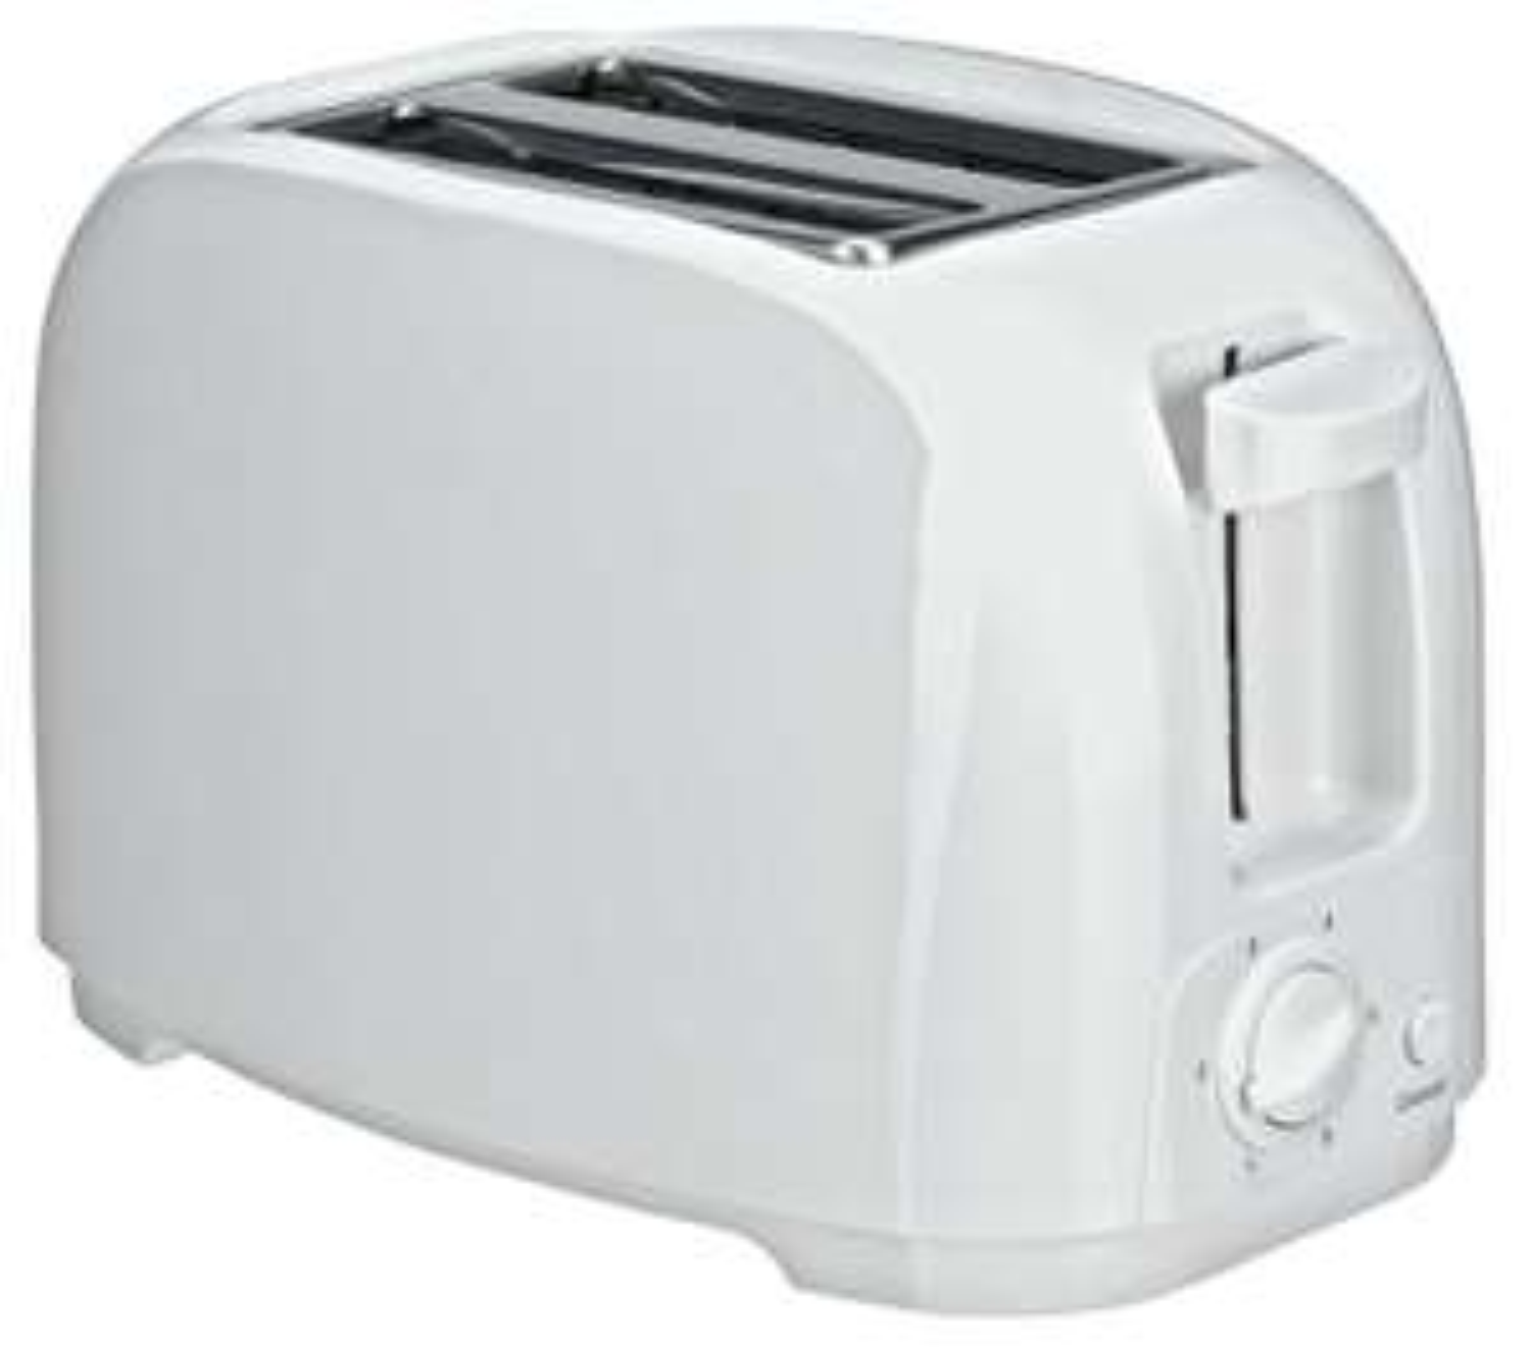 Simple Value 2 Slice Toaster White / Cordless Kettle White 1.7L £3.99 each @ Argos